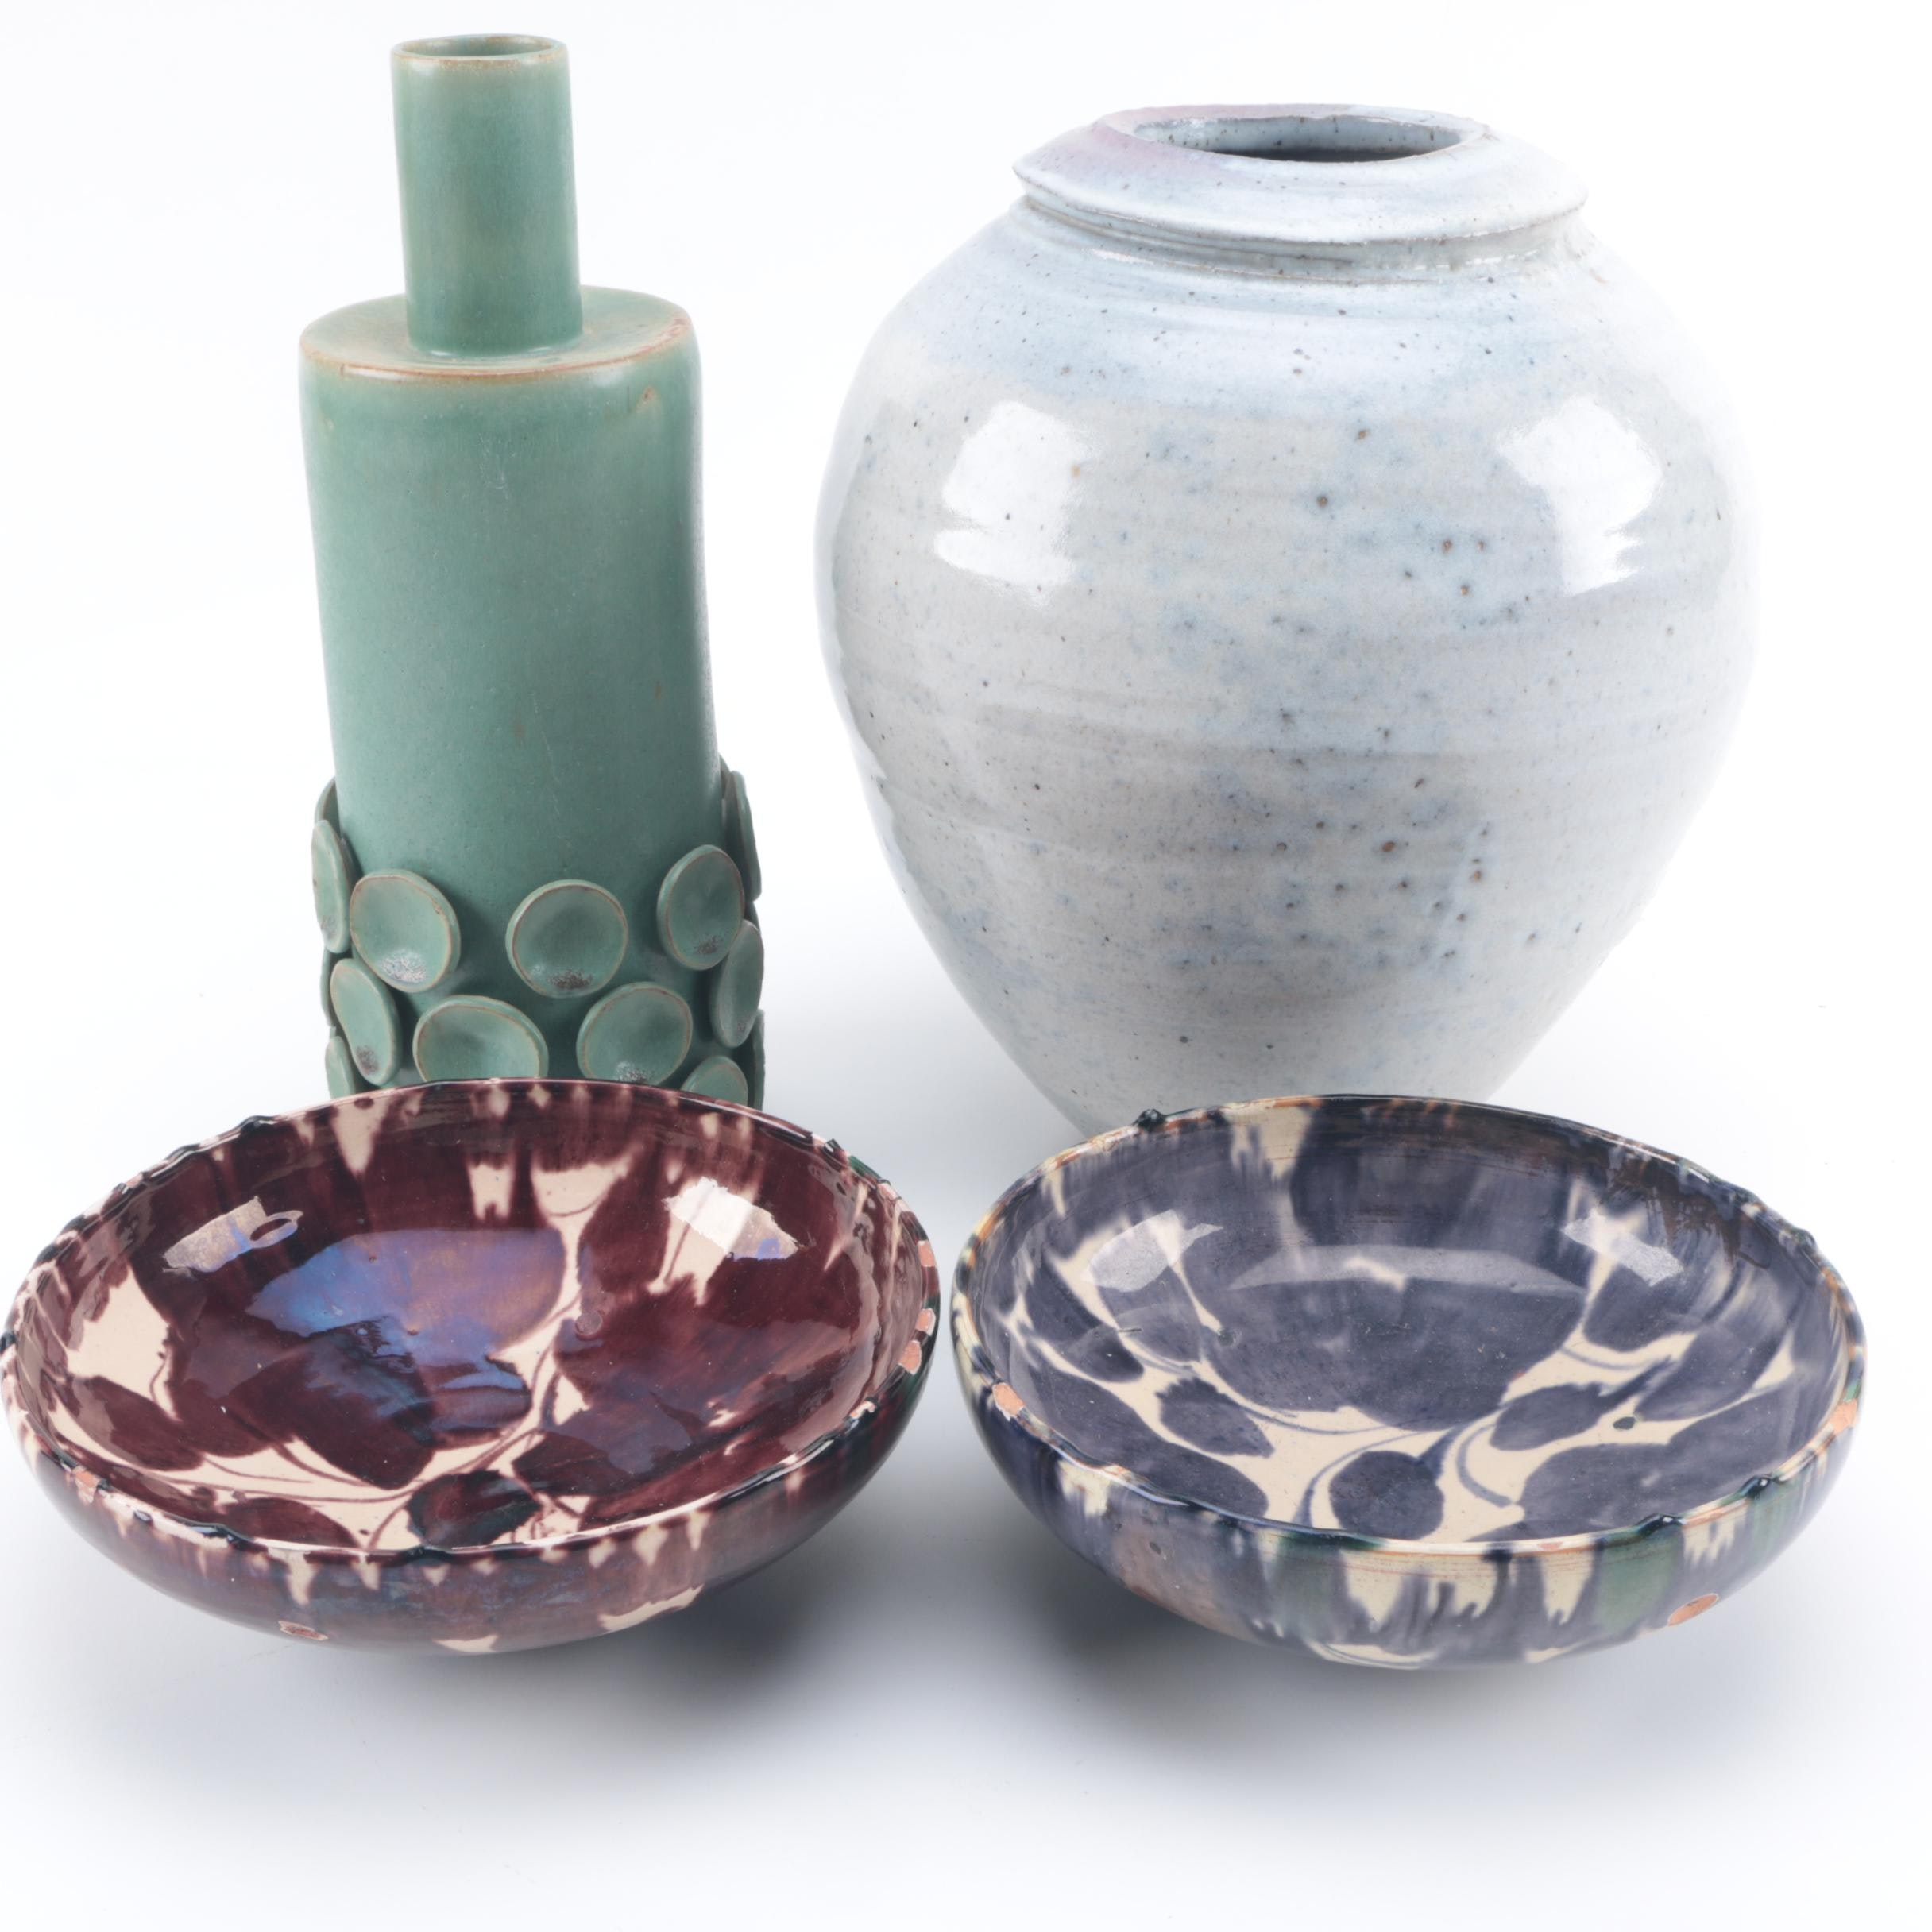 Hand Thrown Stoneware Vessels Including Oaxaca